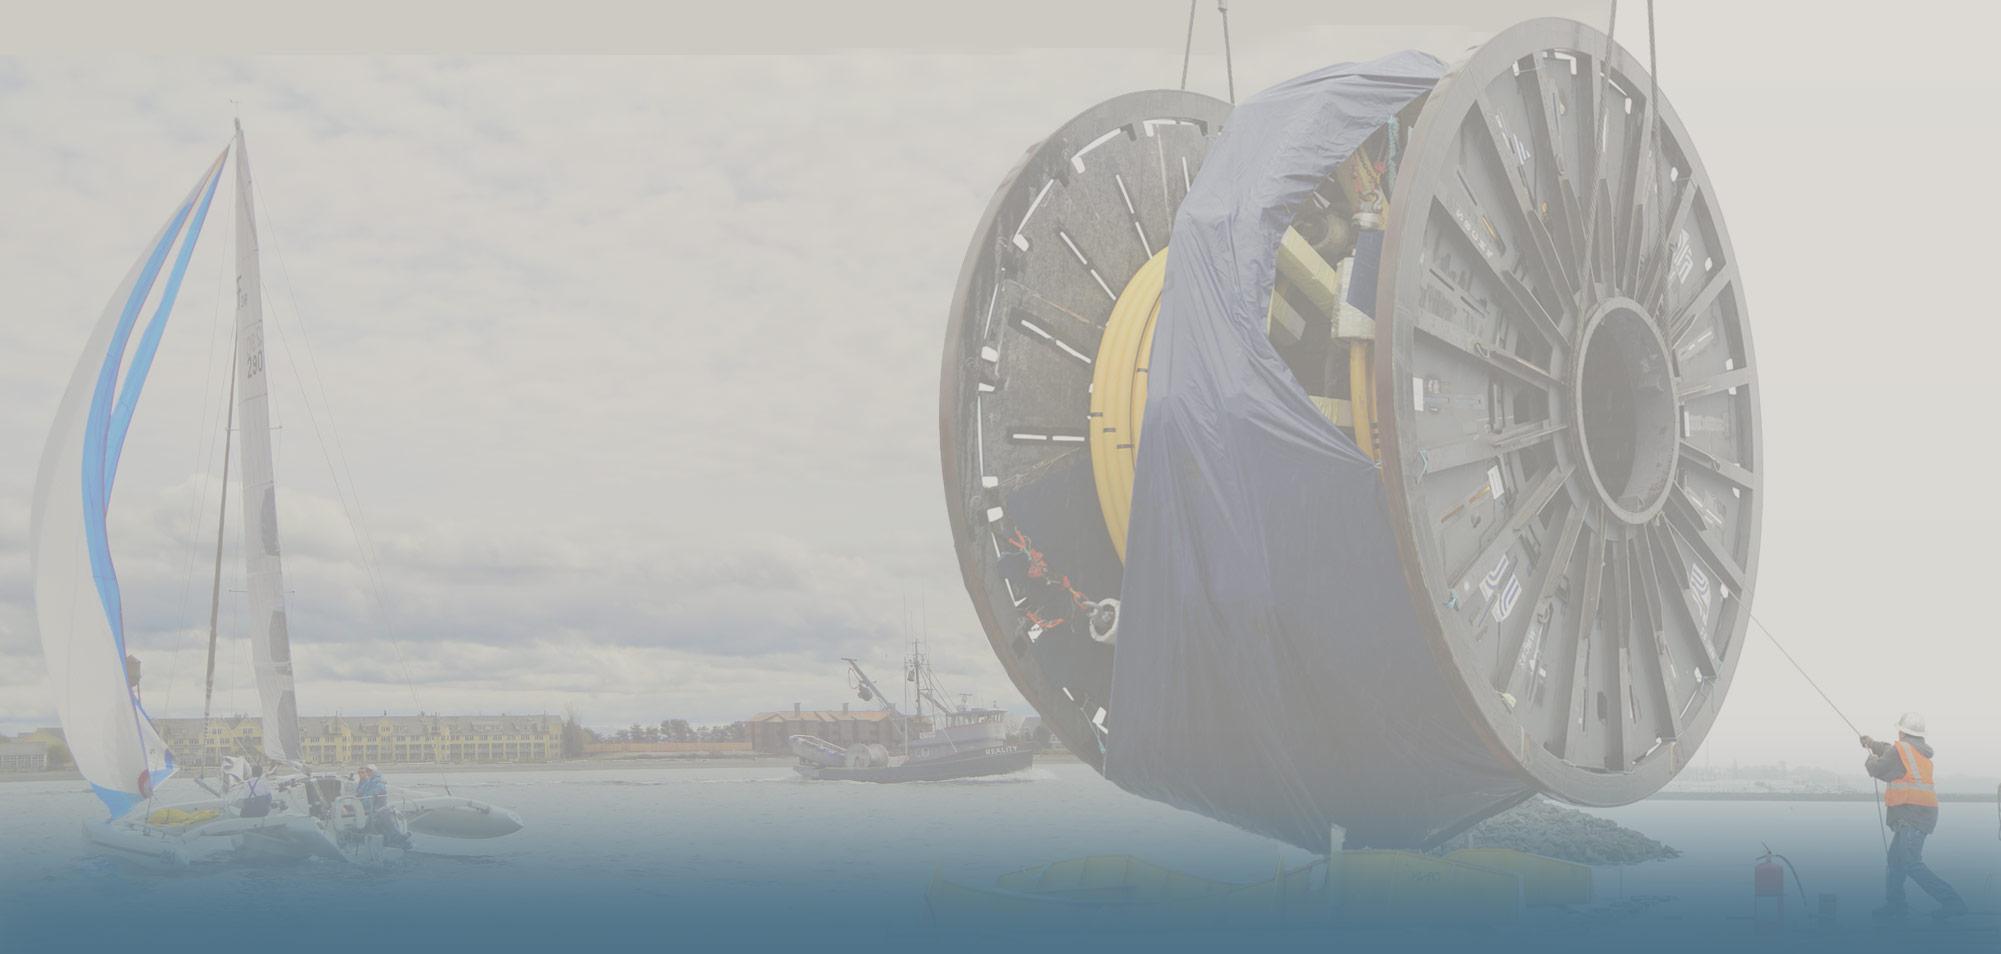 Tides port of bellingham wa official website agendas minutes nvjuhfo Image collections